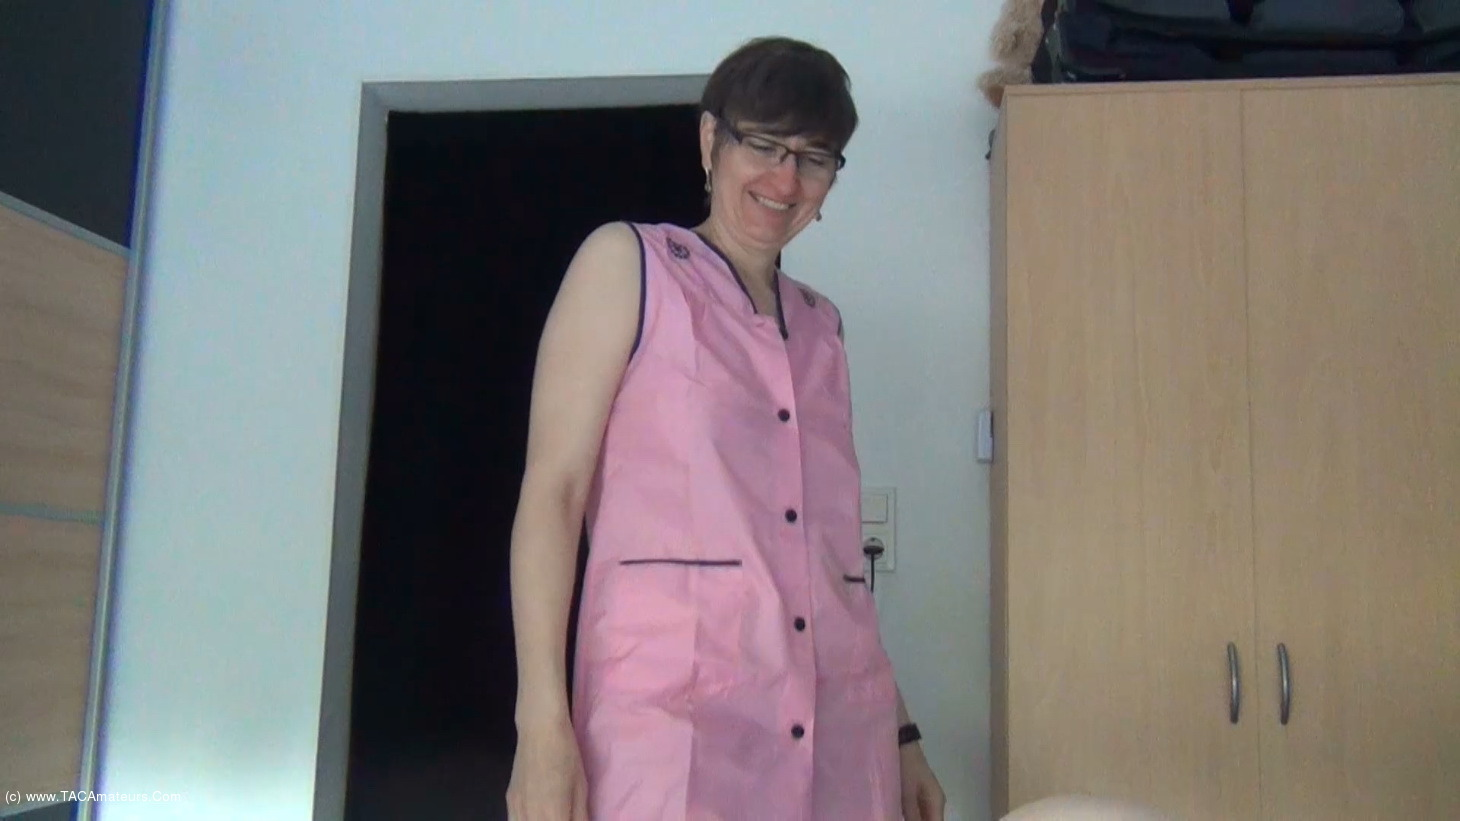 HotMilf - Blowjob In The Pink Apron scene 3